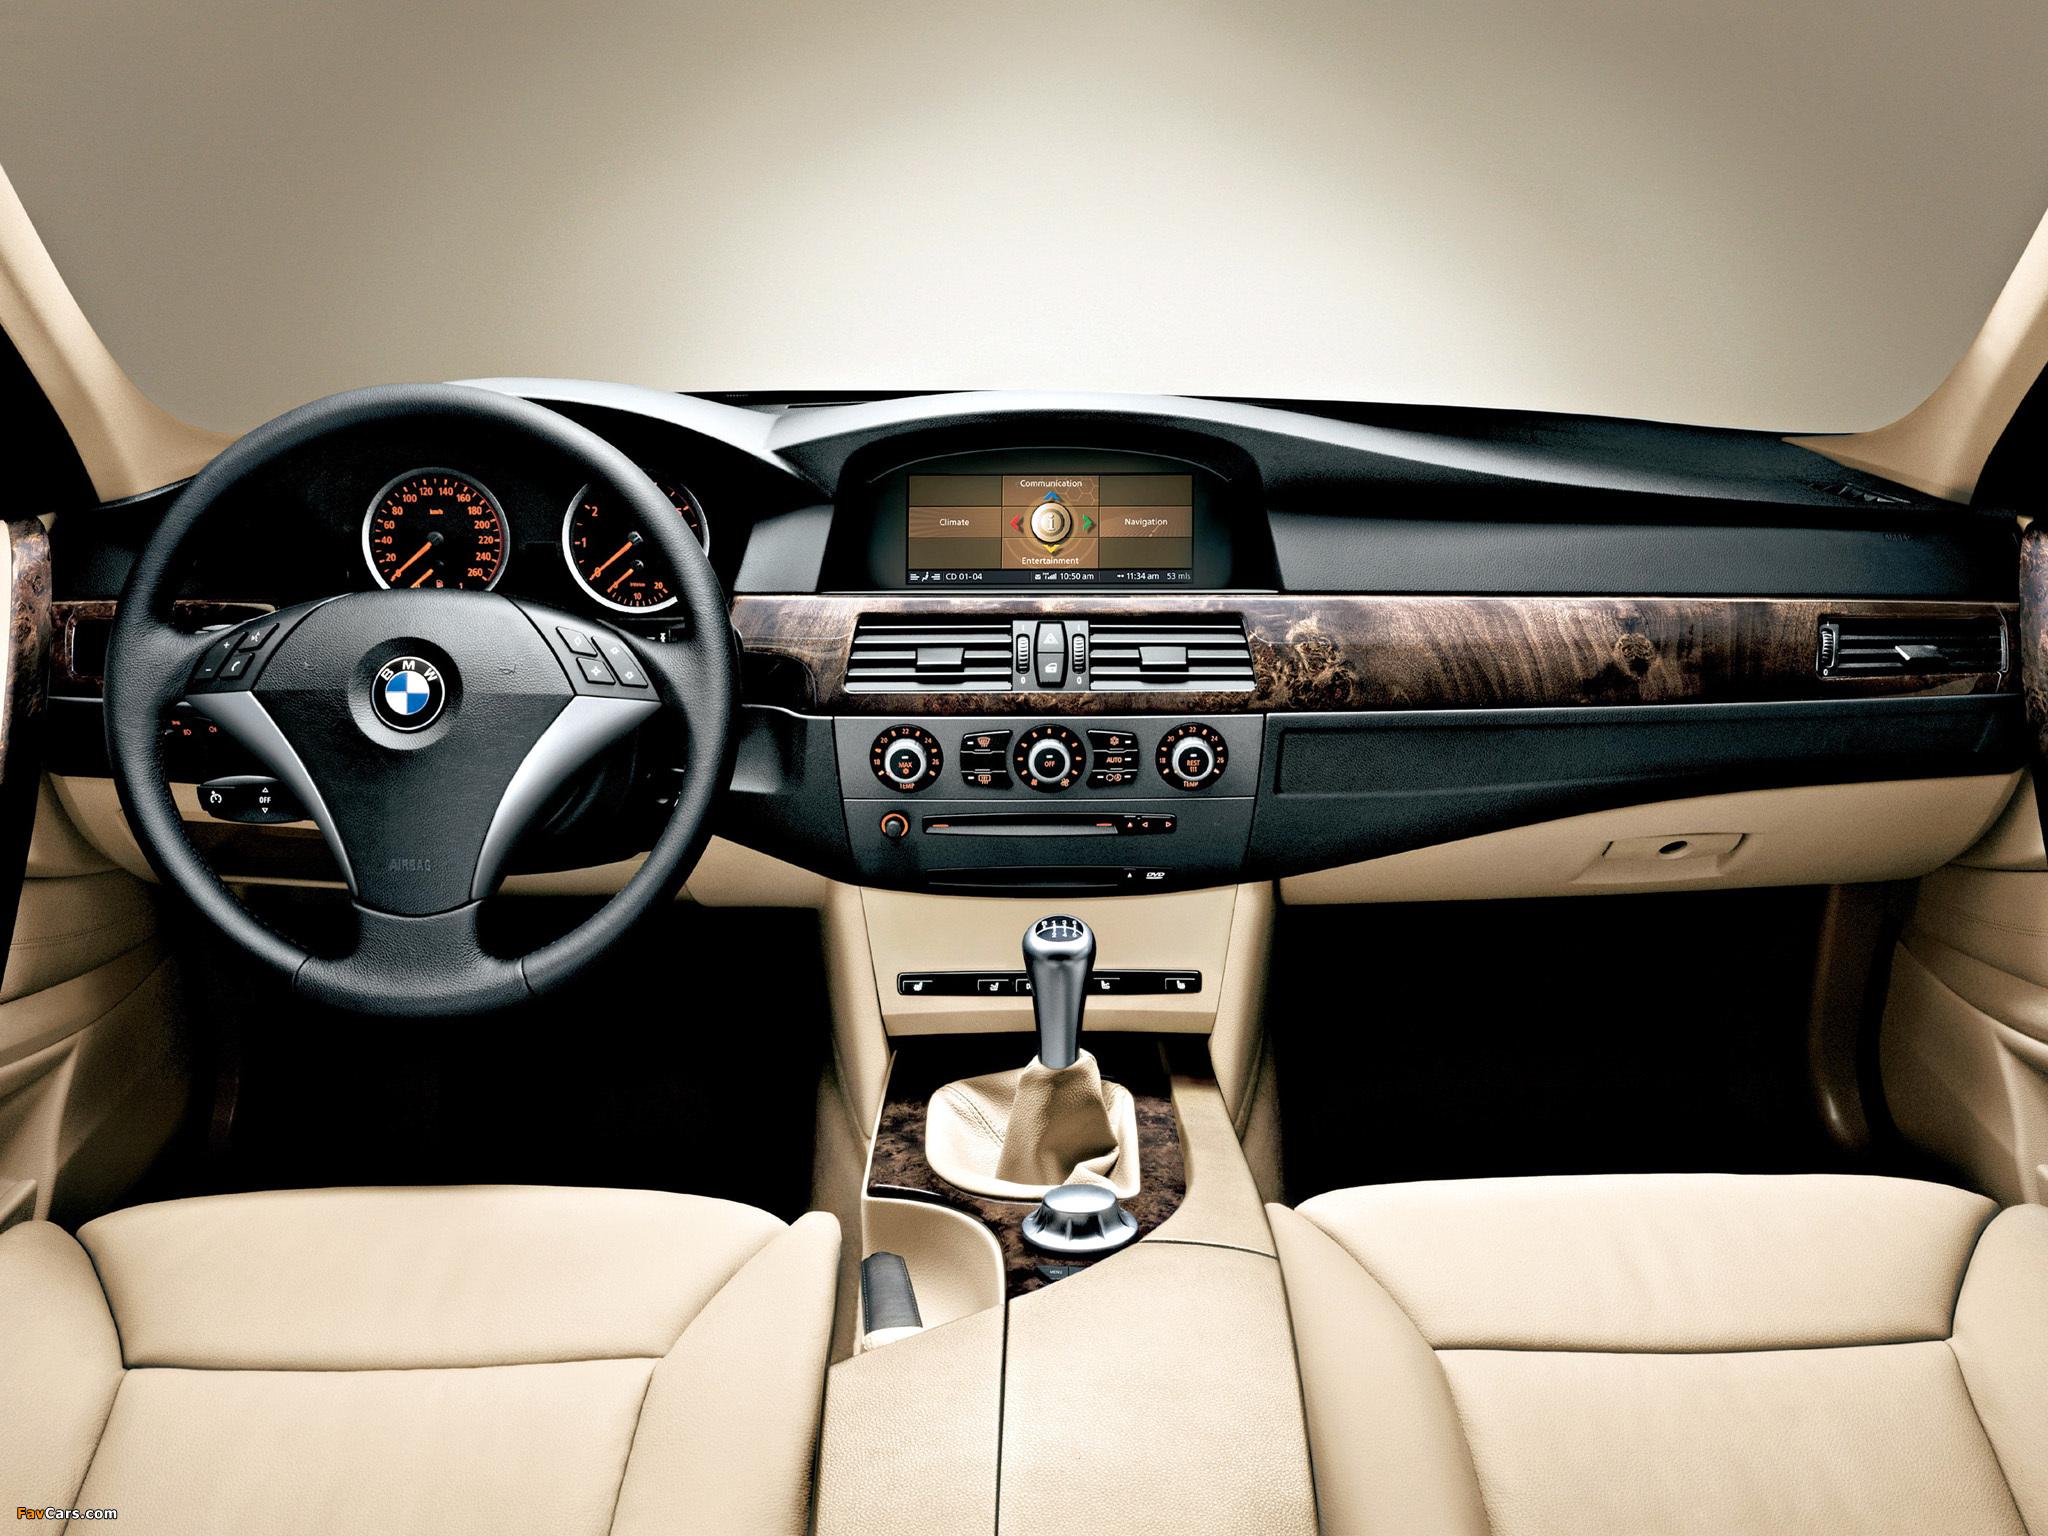 Особенности системы безопасности на BMW 1-Series Е78